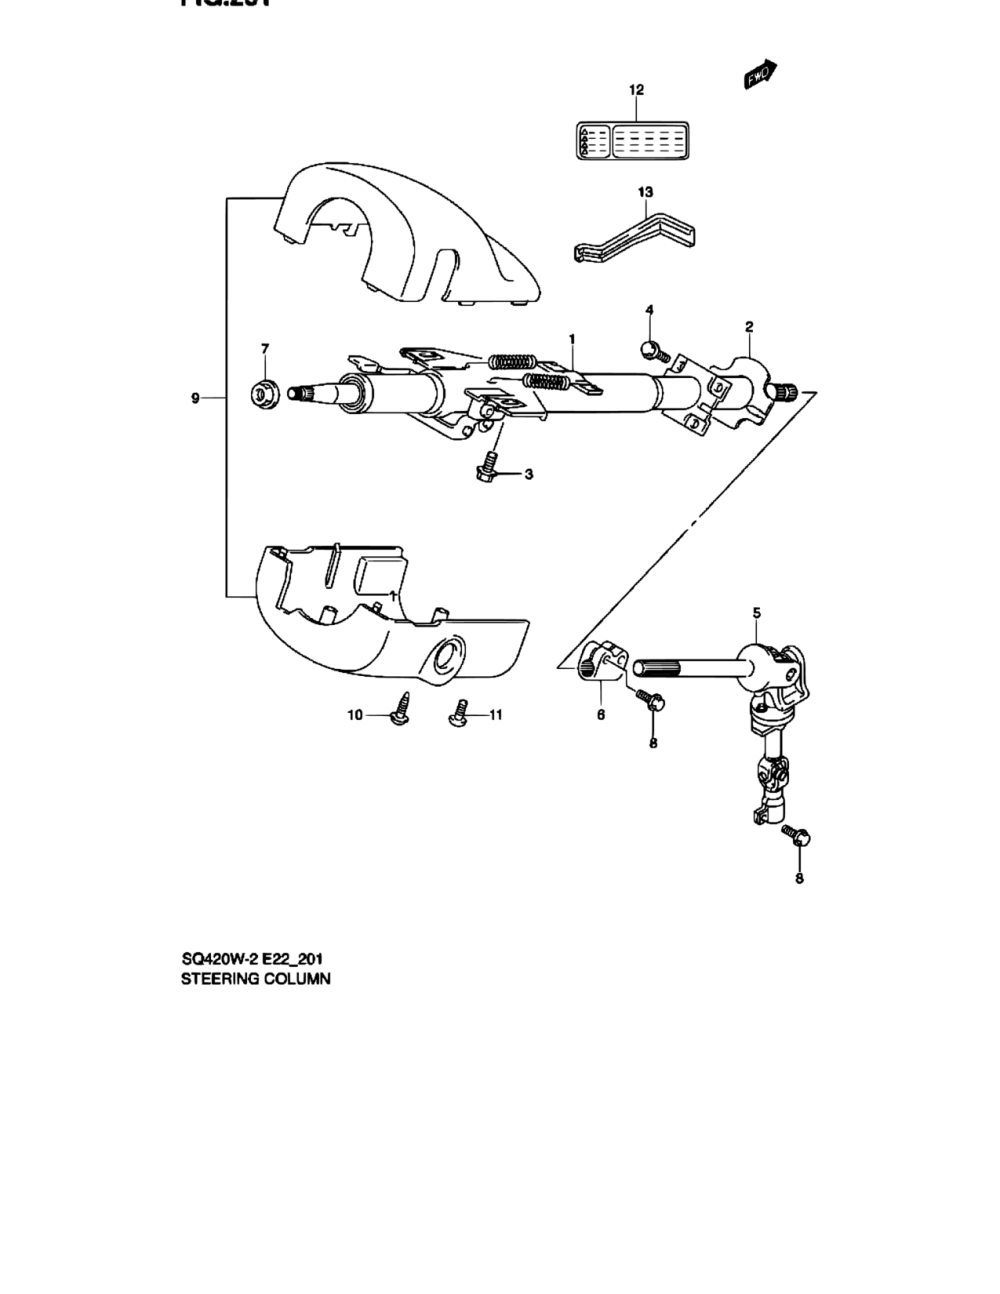 medium resolution of kenworth steering linkage diagram wiring diagram expert kenworth steering linkage diagram